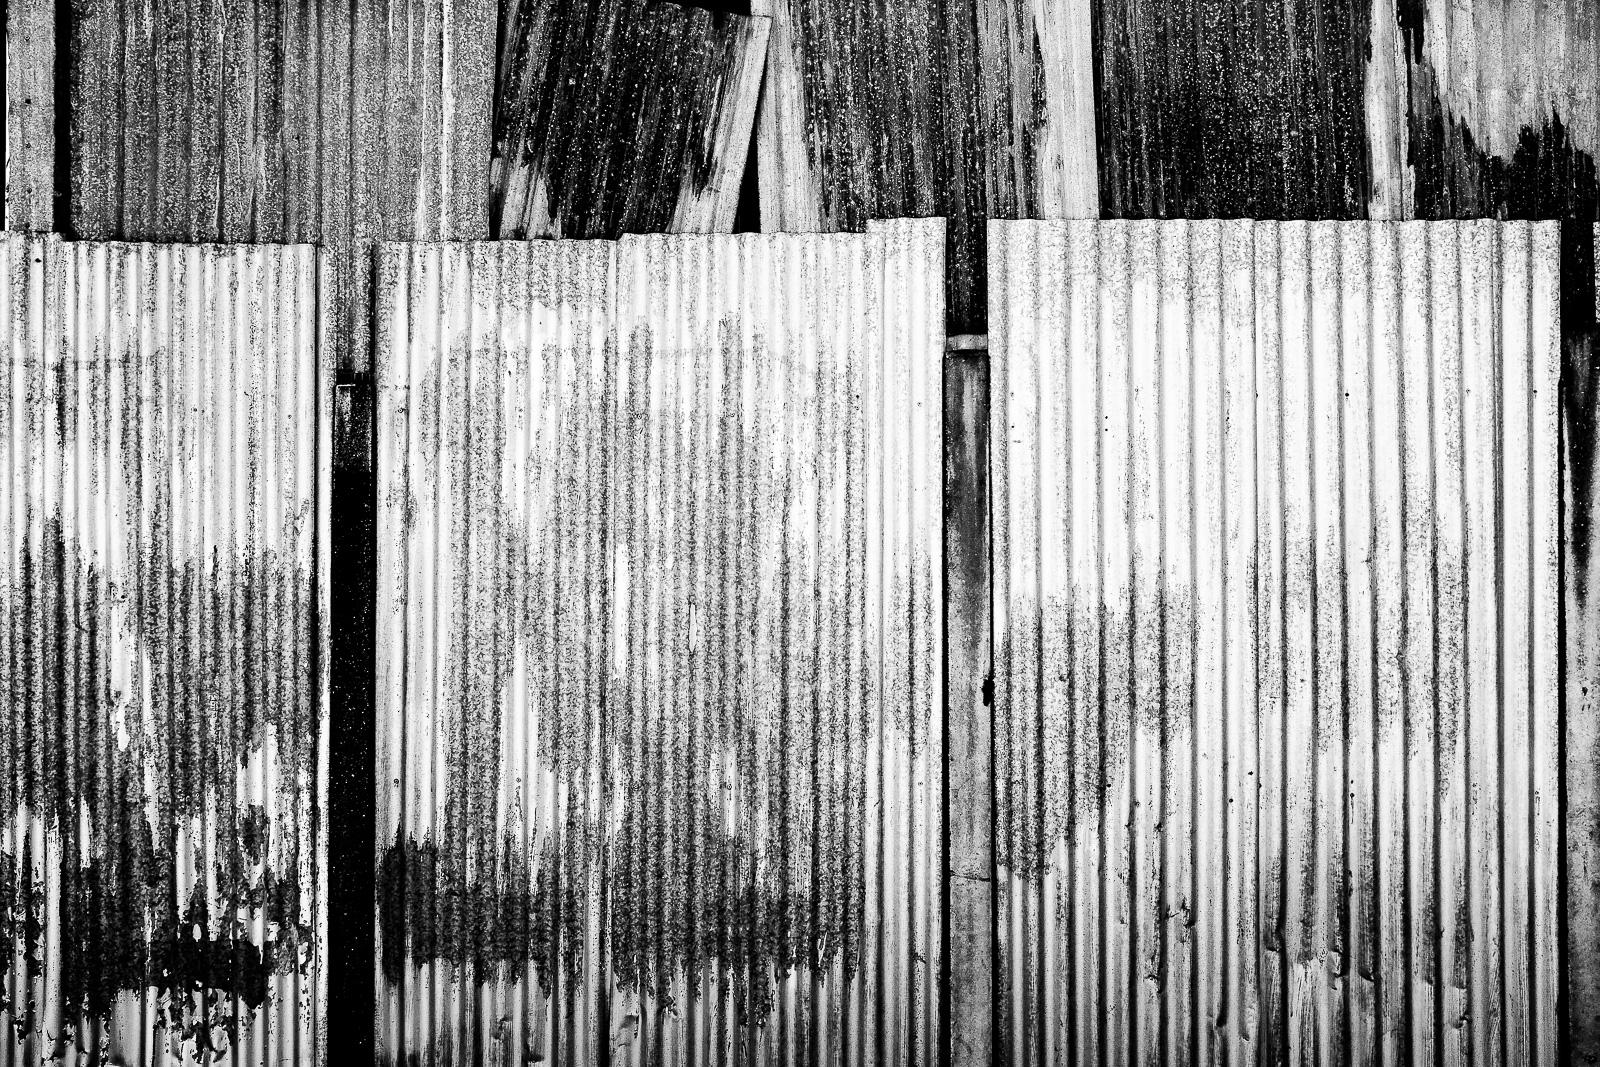 DSCF3176-BearbeitetIndustrial_NicoleStruppert.jpg